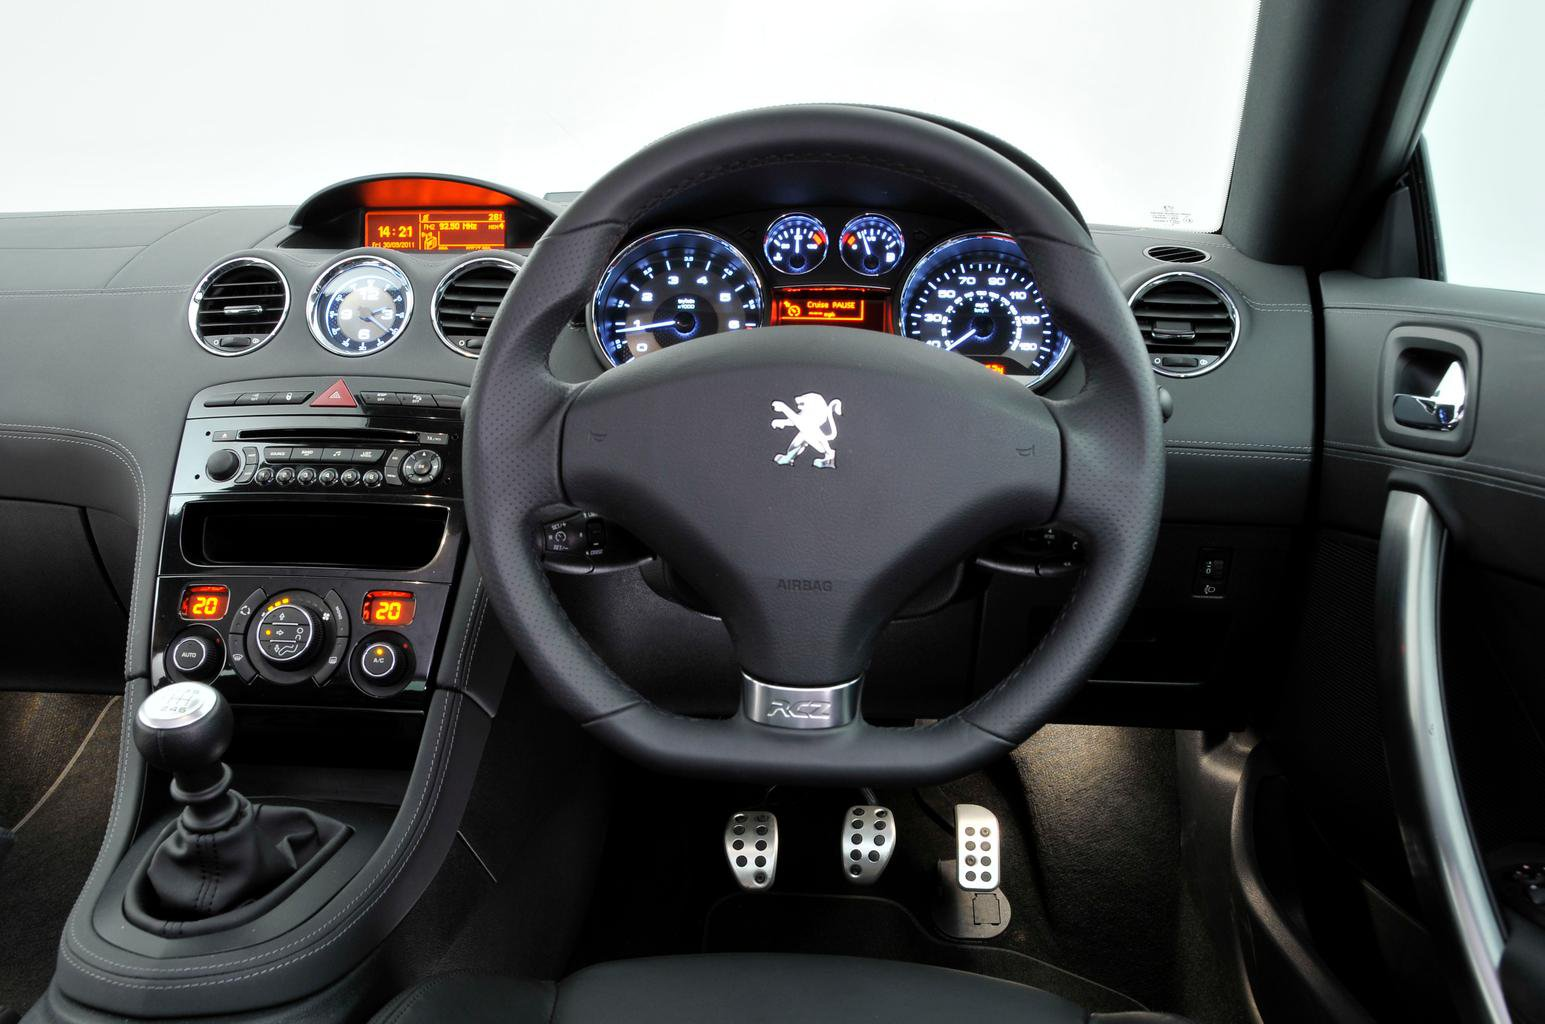 Used test – sporty coupés: Mini Coupe vs Peugeot RCZ vs Volkswagen Scirocco